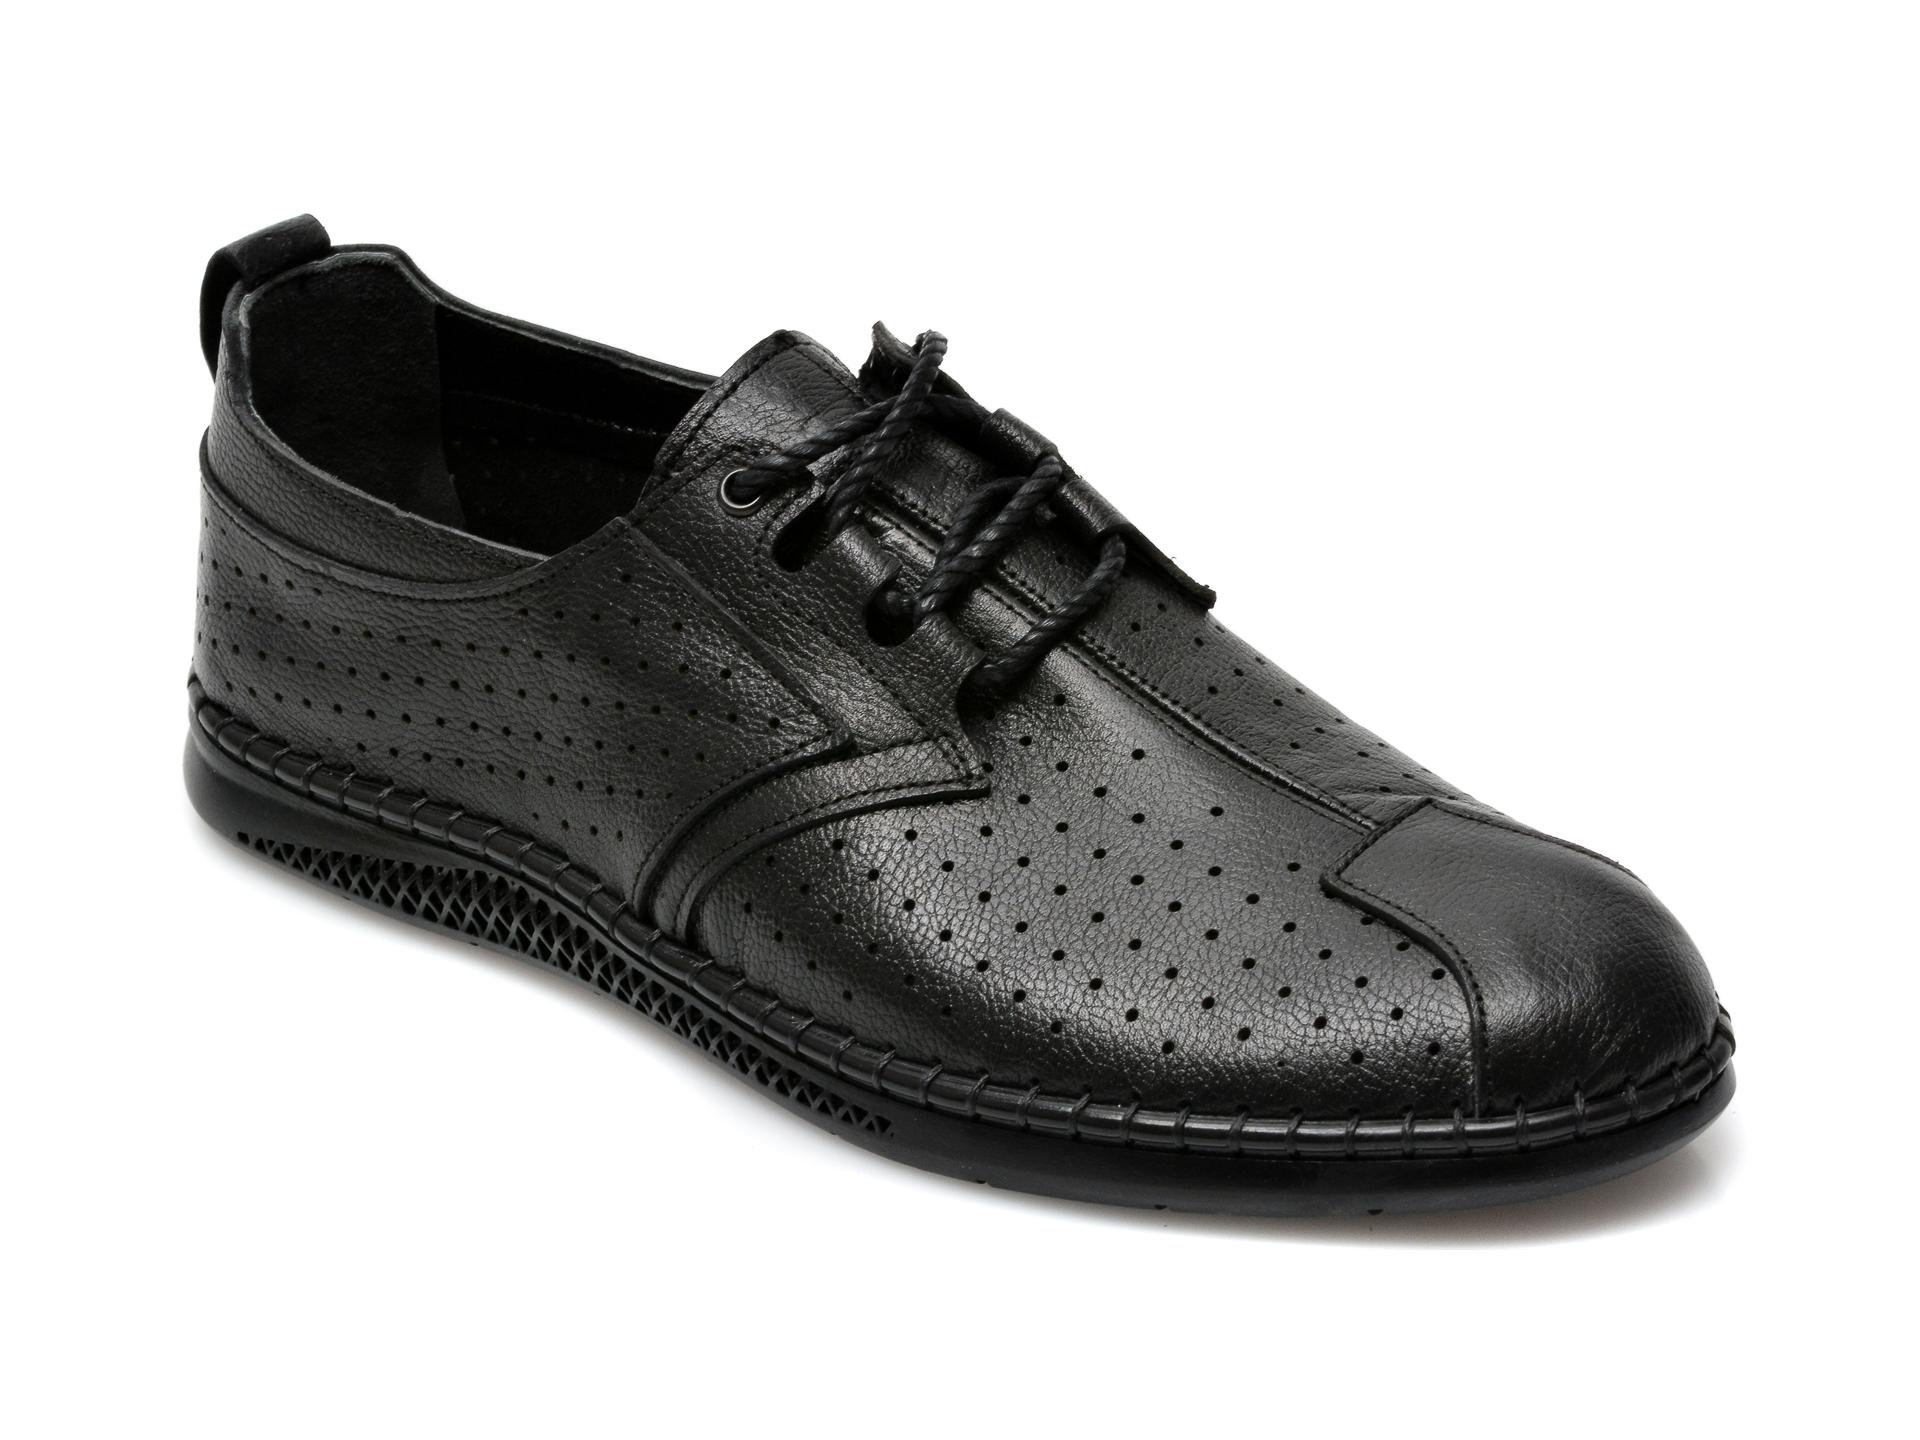 Pantofi OTTER negri, M6058, din piele naturala